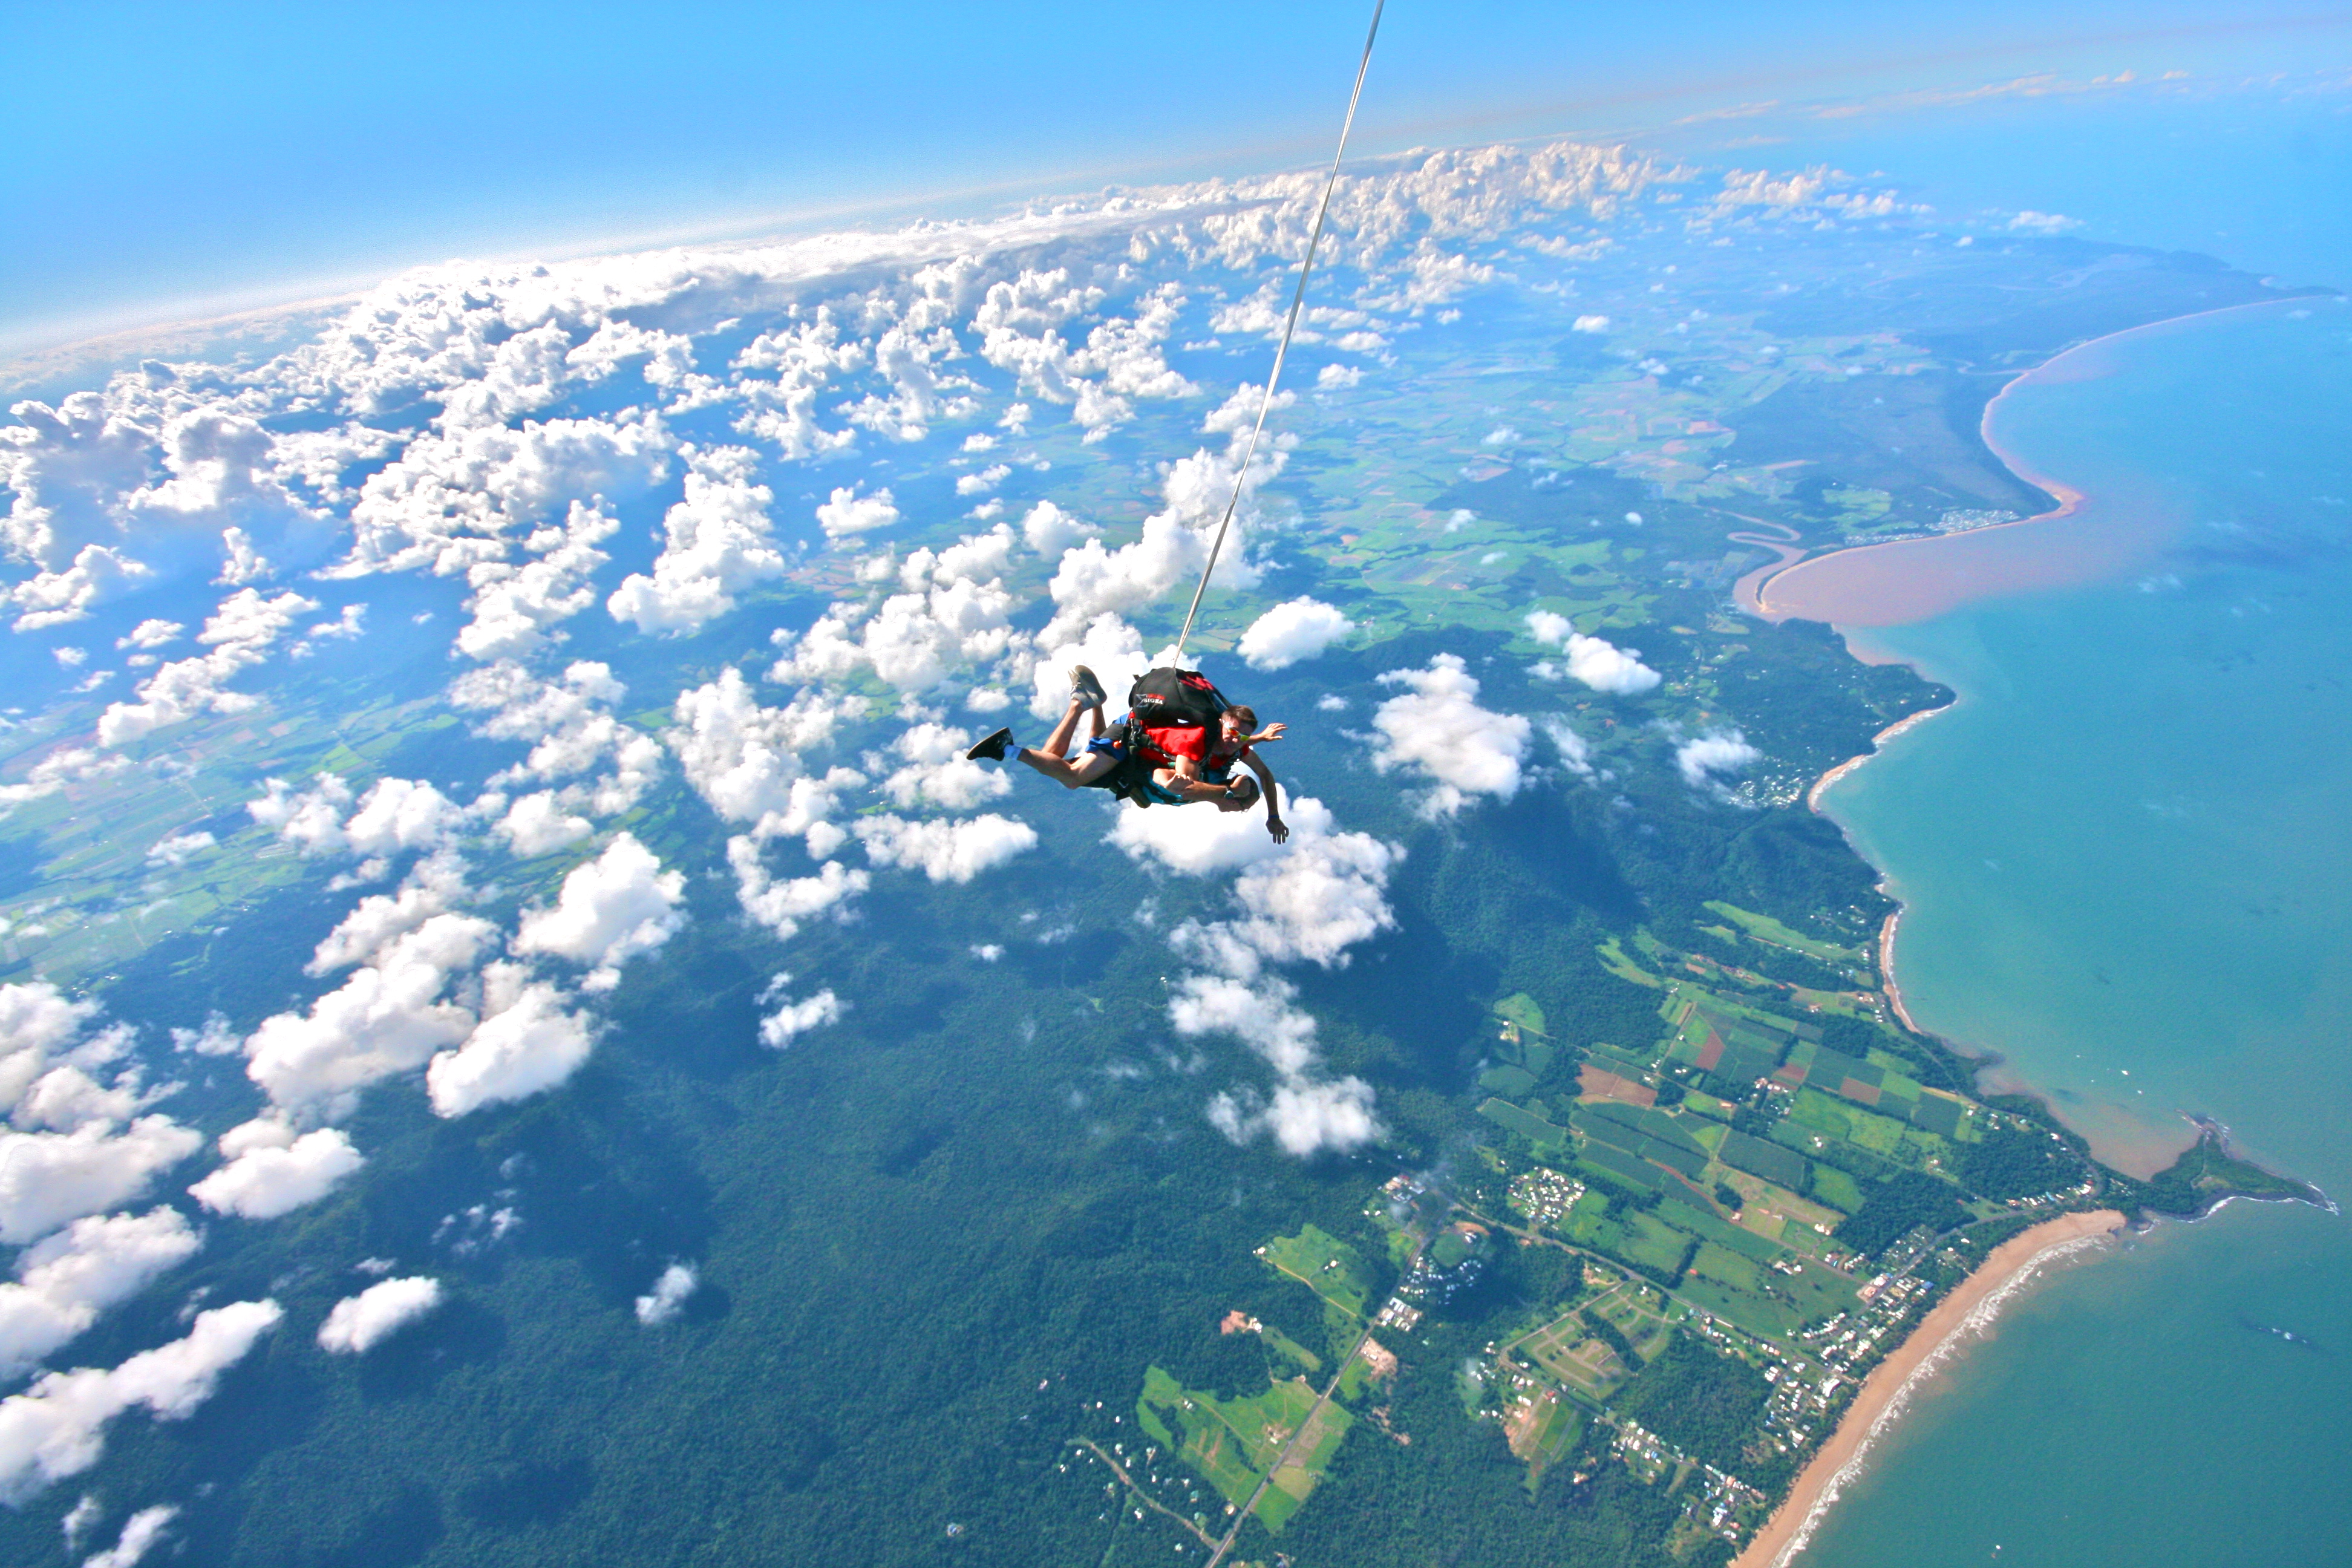 australia skydive mission beach travels of a flight. Black Bedroom Furniture Sets. Home Design Ideas